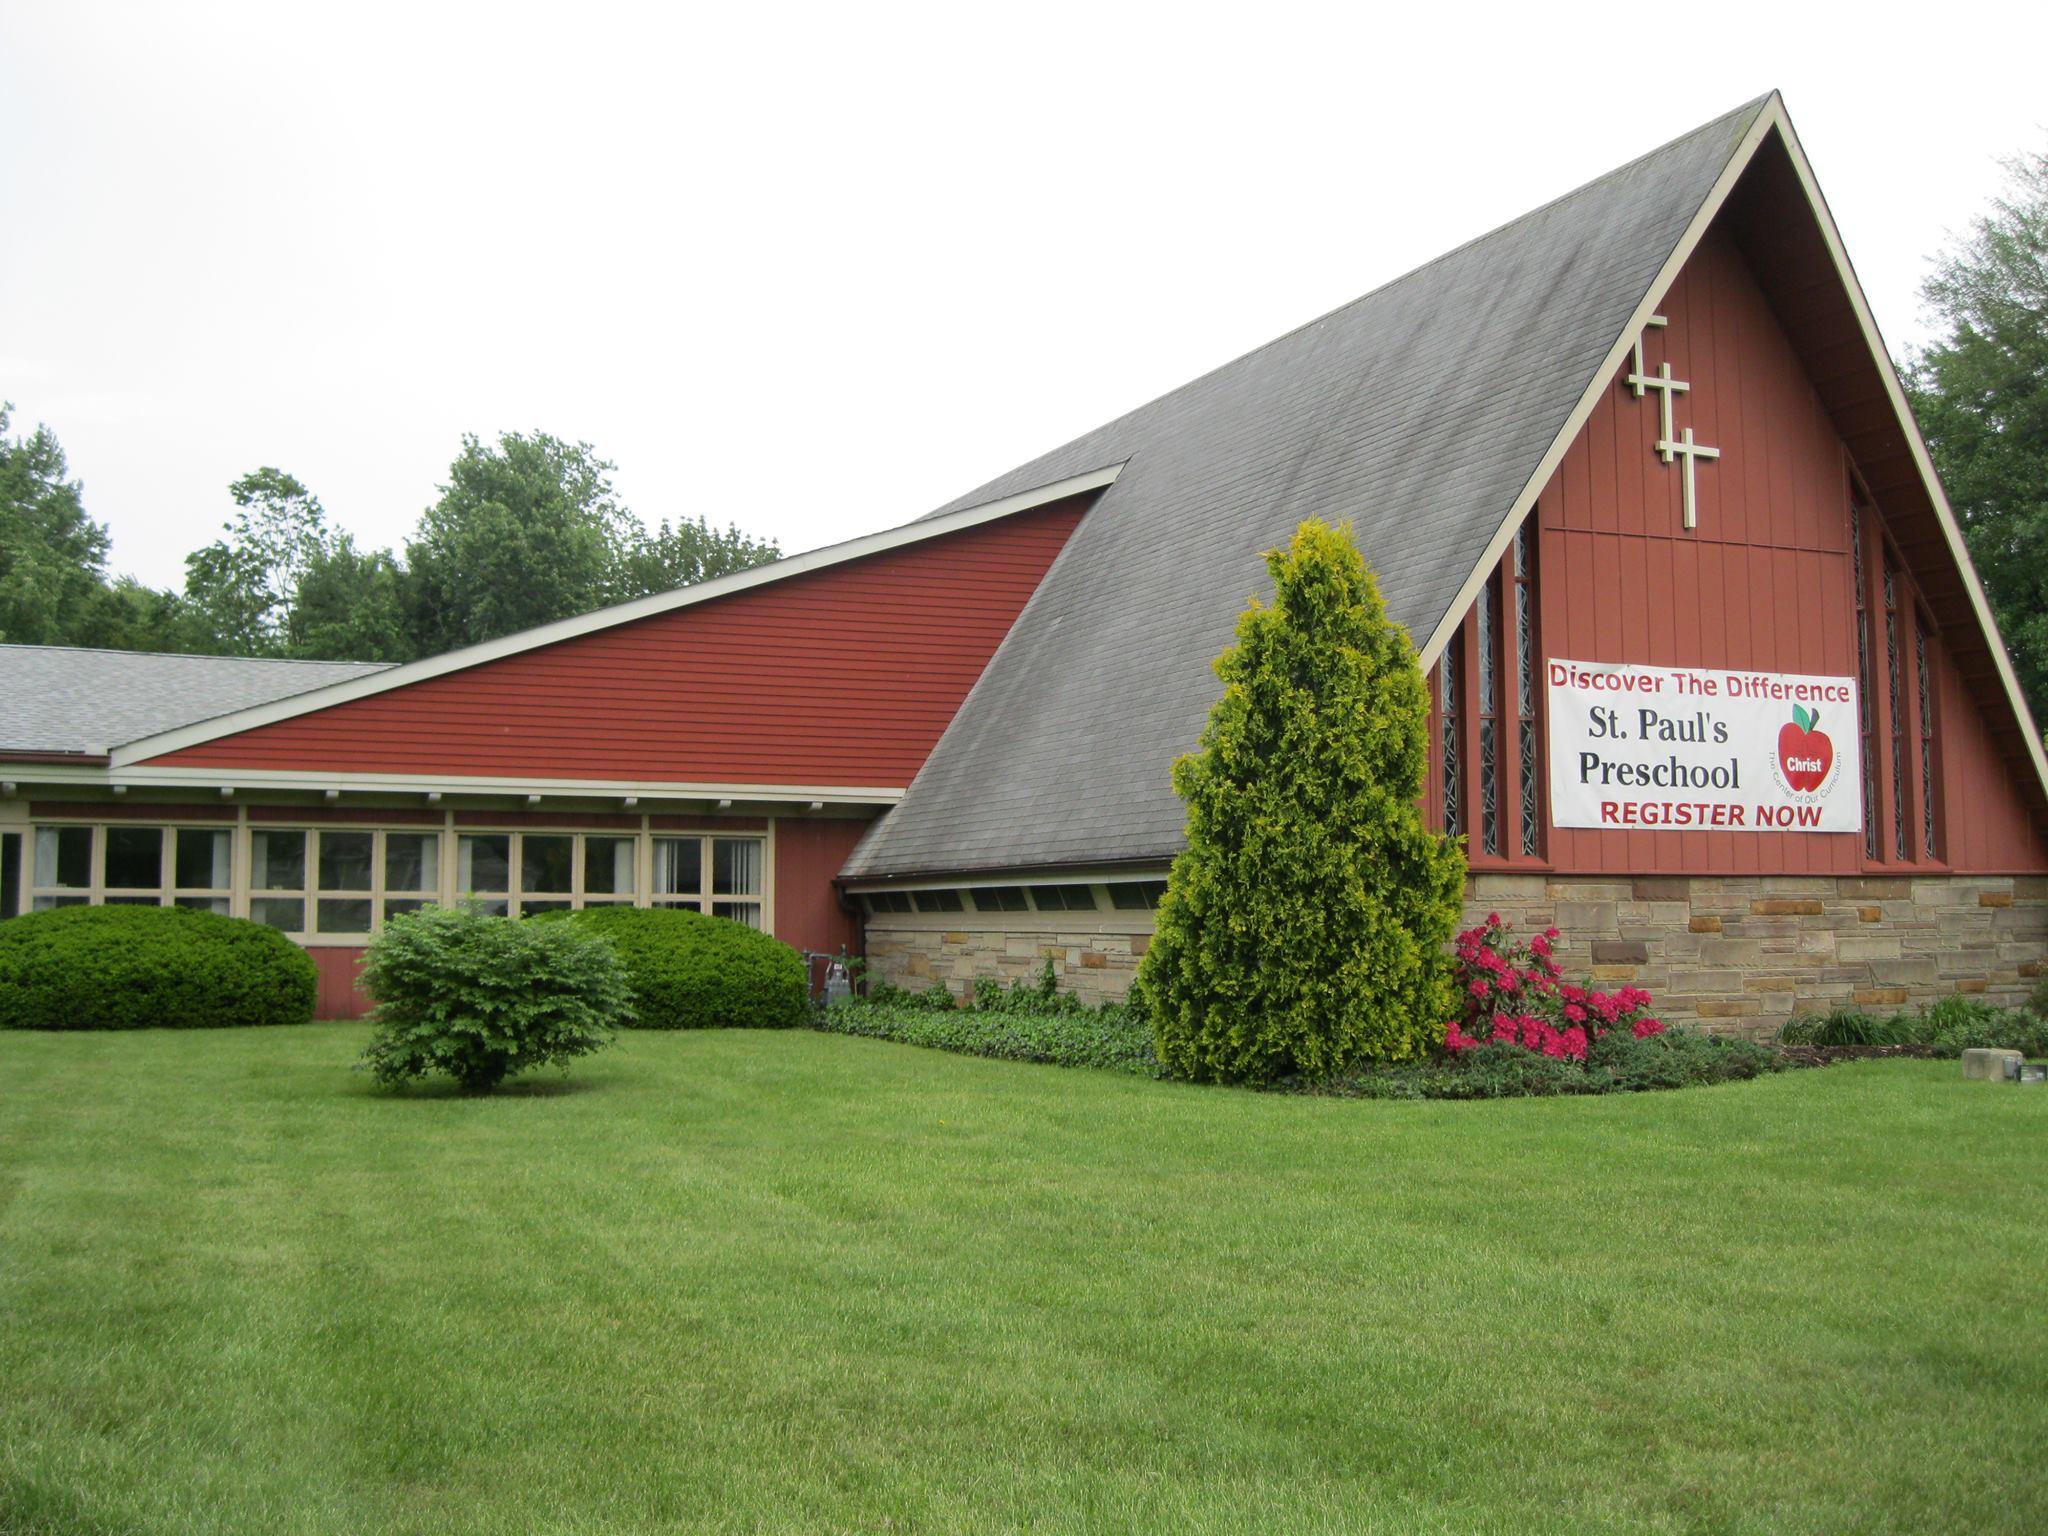 St. Paul's